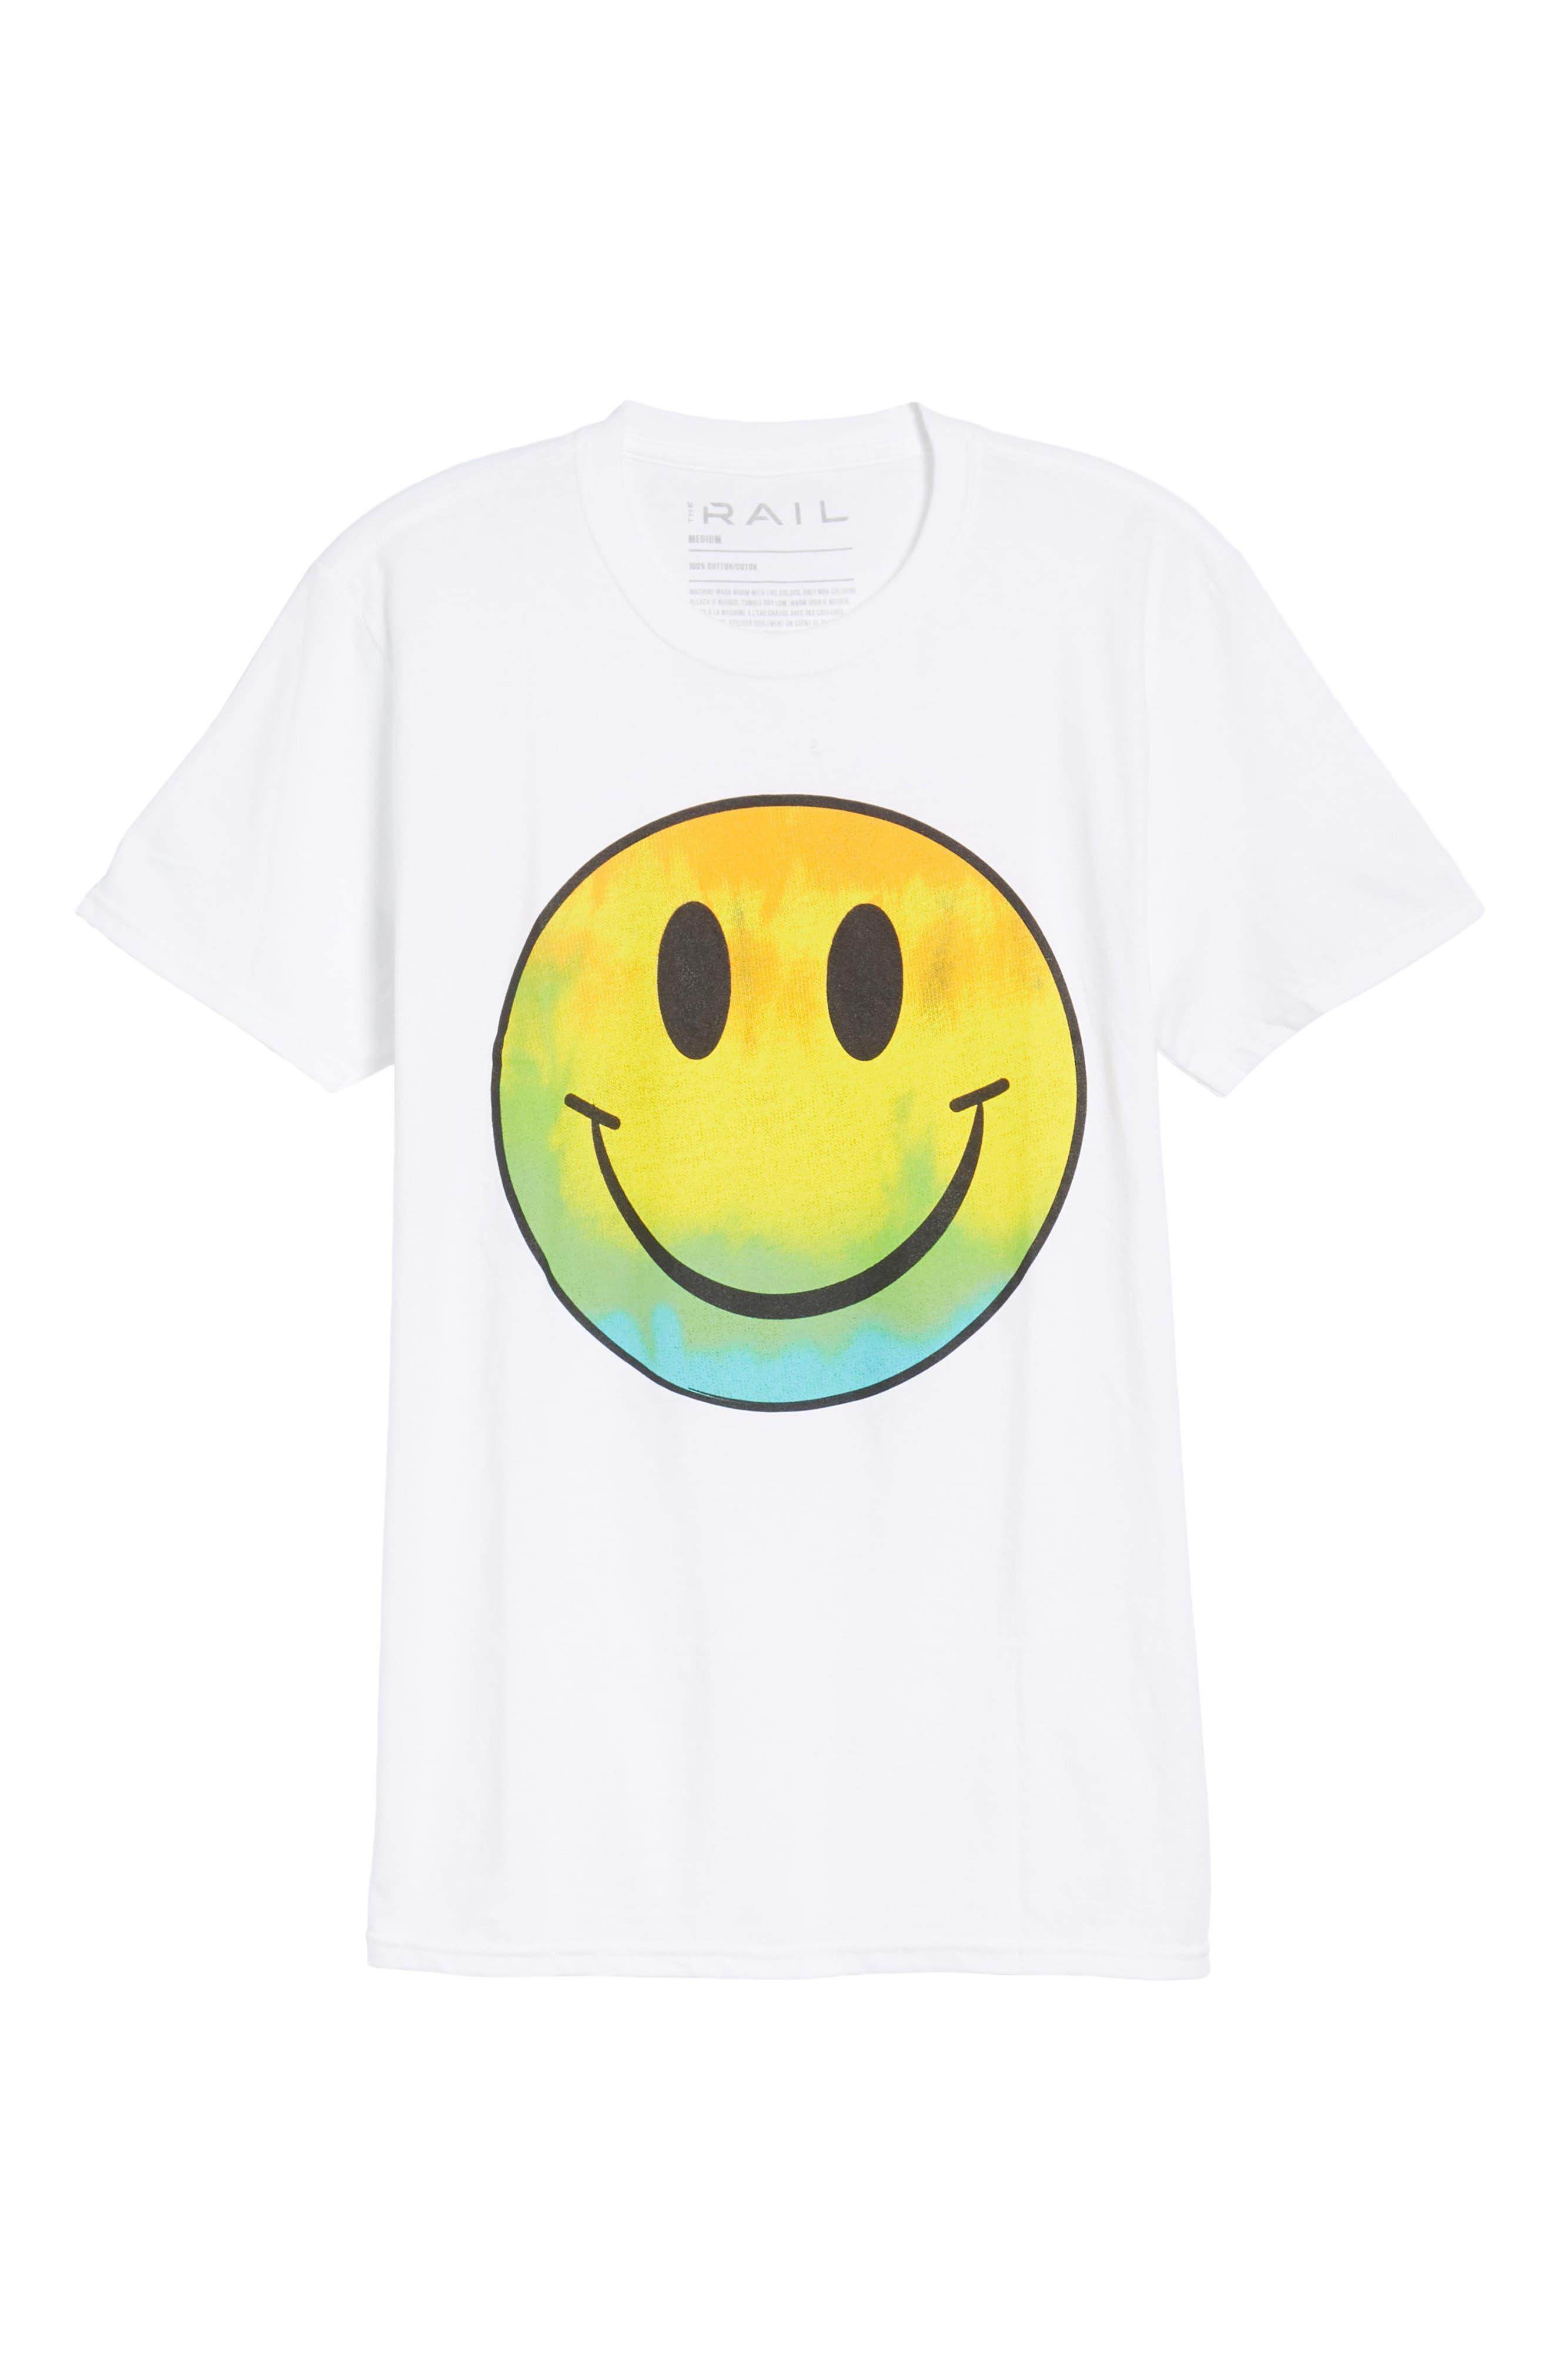 Tie Dye Smiley Face T-Shirt,                             Alternate thumbnail 6, color,                             White Tie Dye Smiley Face